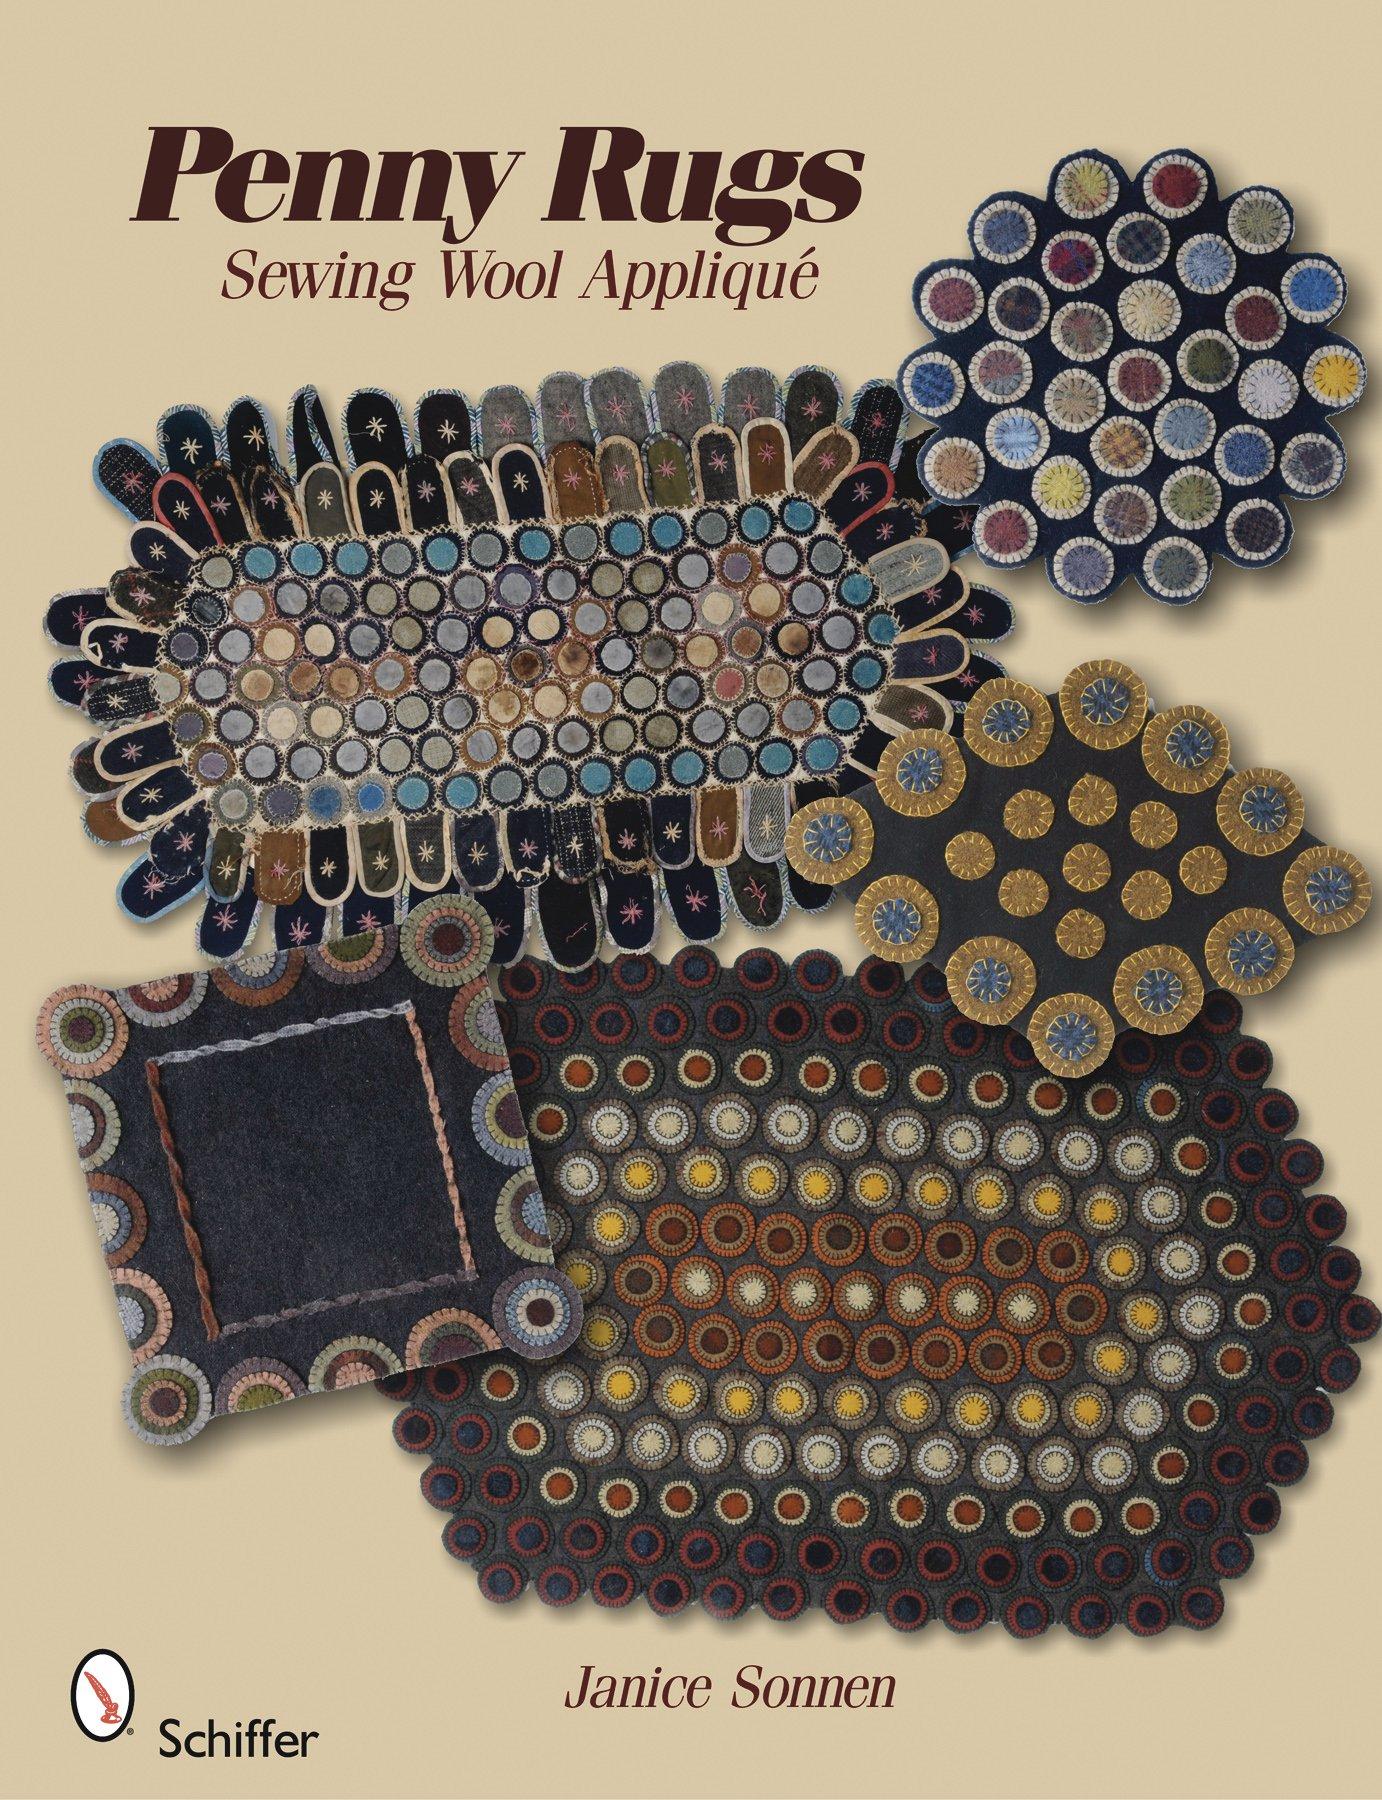 Penny Rugs:  Sewing Wool Applique, Janice Sonnen